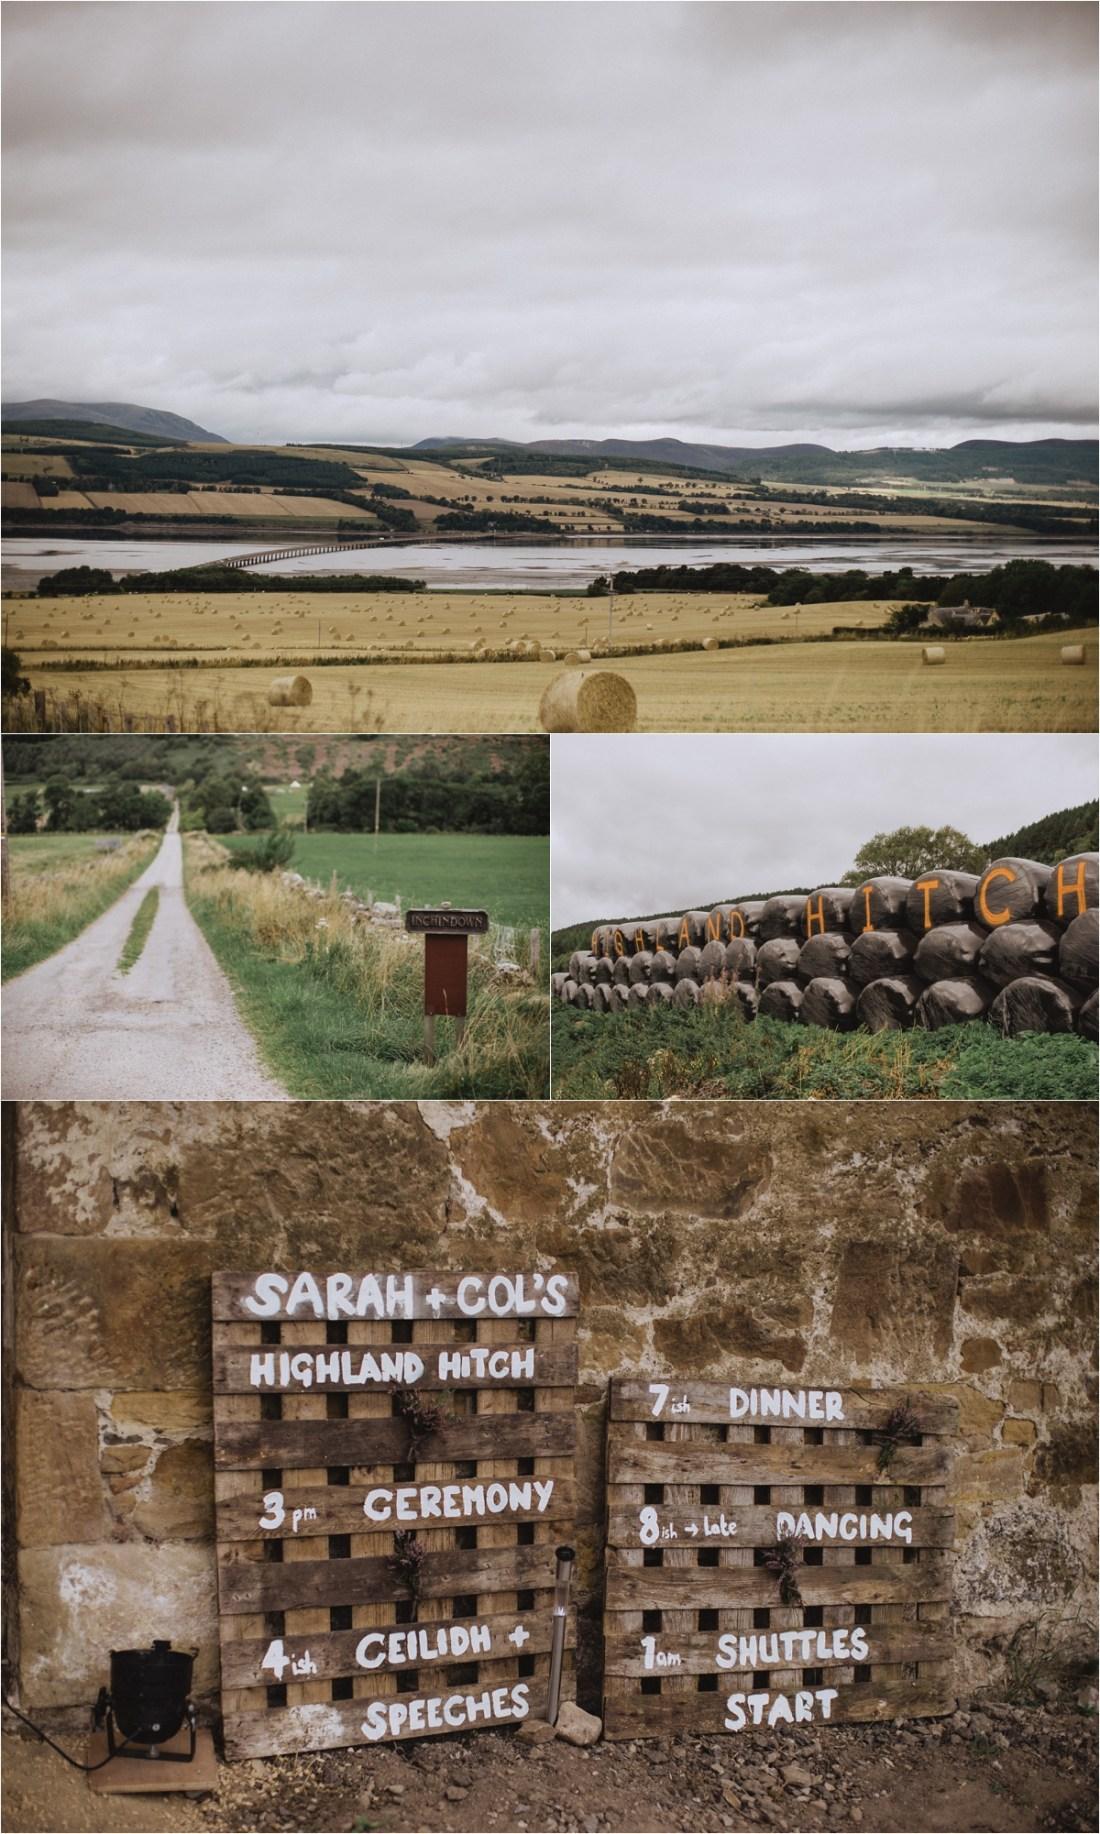 Sheep farm wedding location on a family farm in Scotland by Fox & Bear Photography